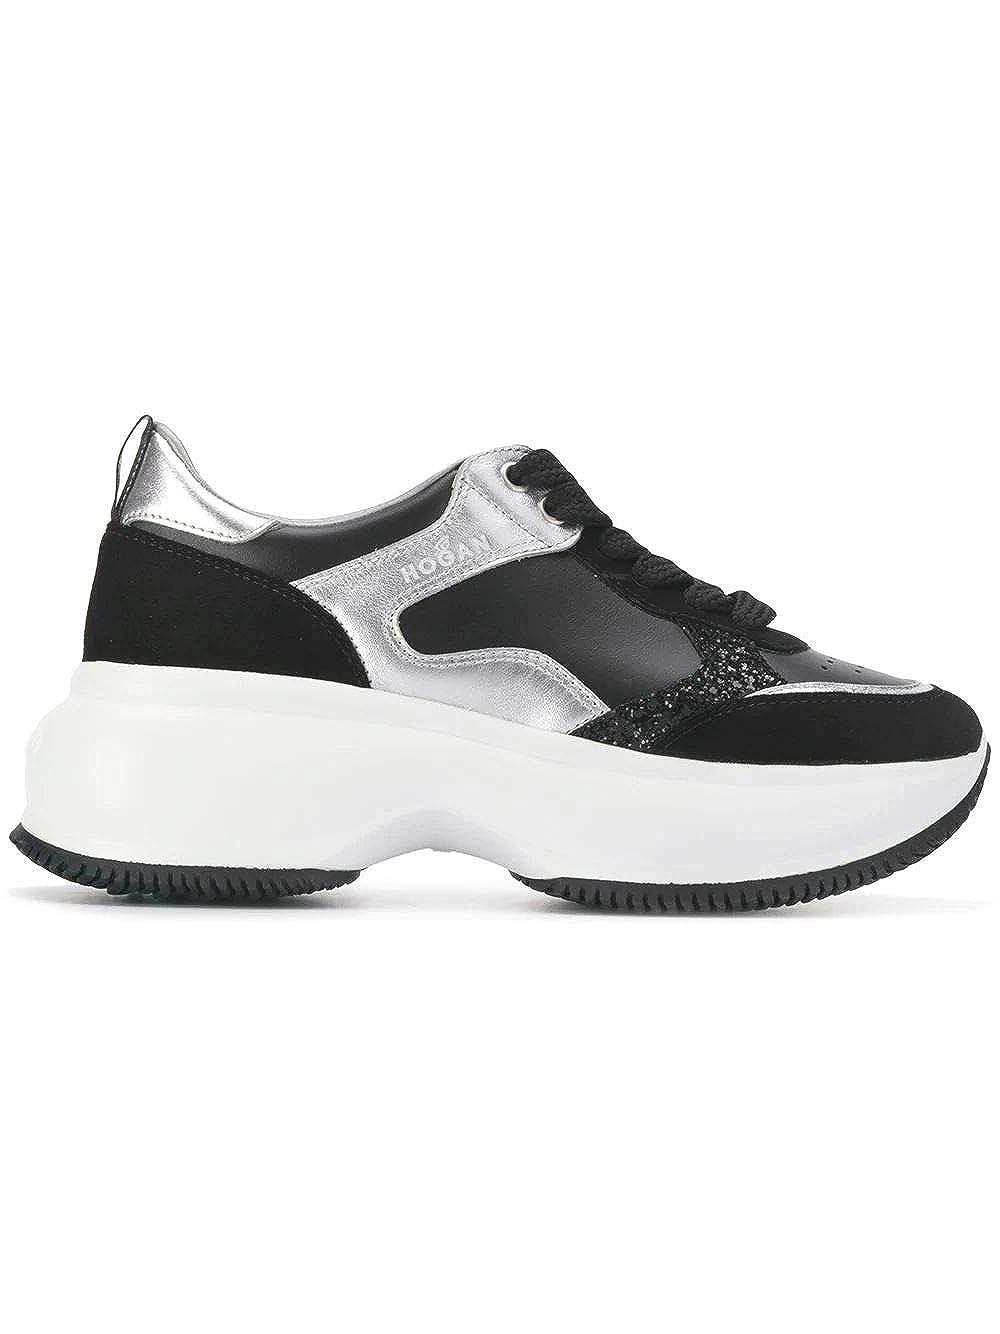 - Hogan Women's HXW4350BN50KOZ0353 Black Leather Sneakers